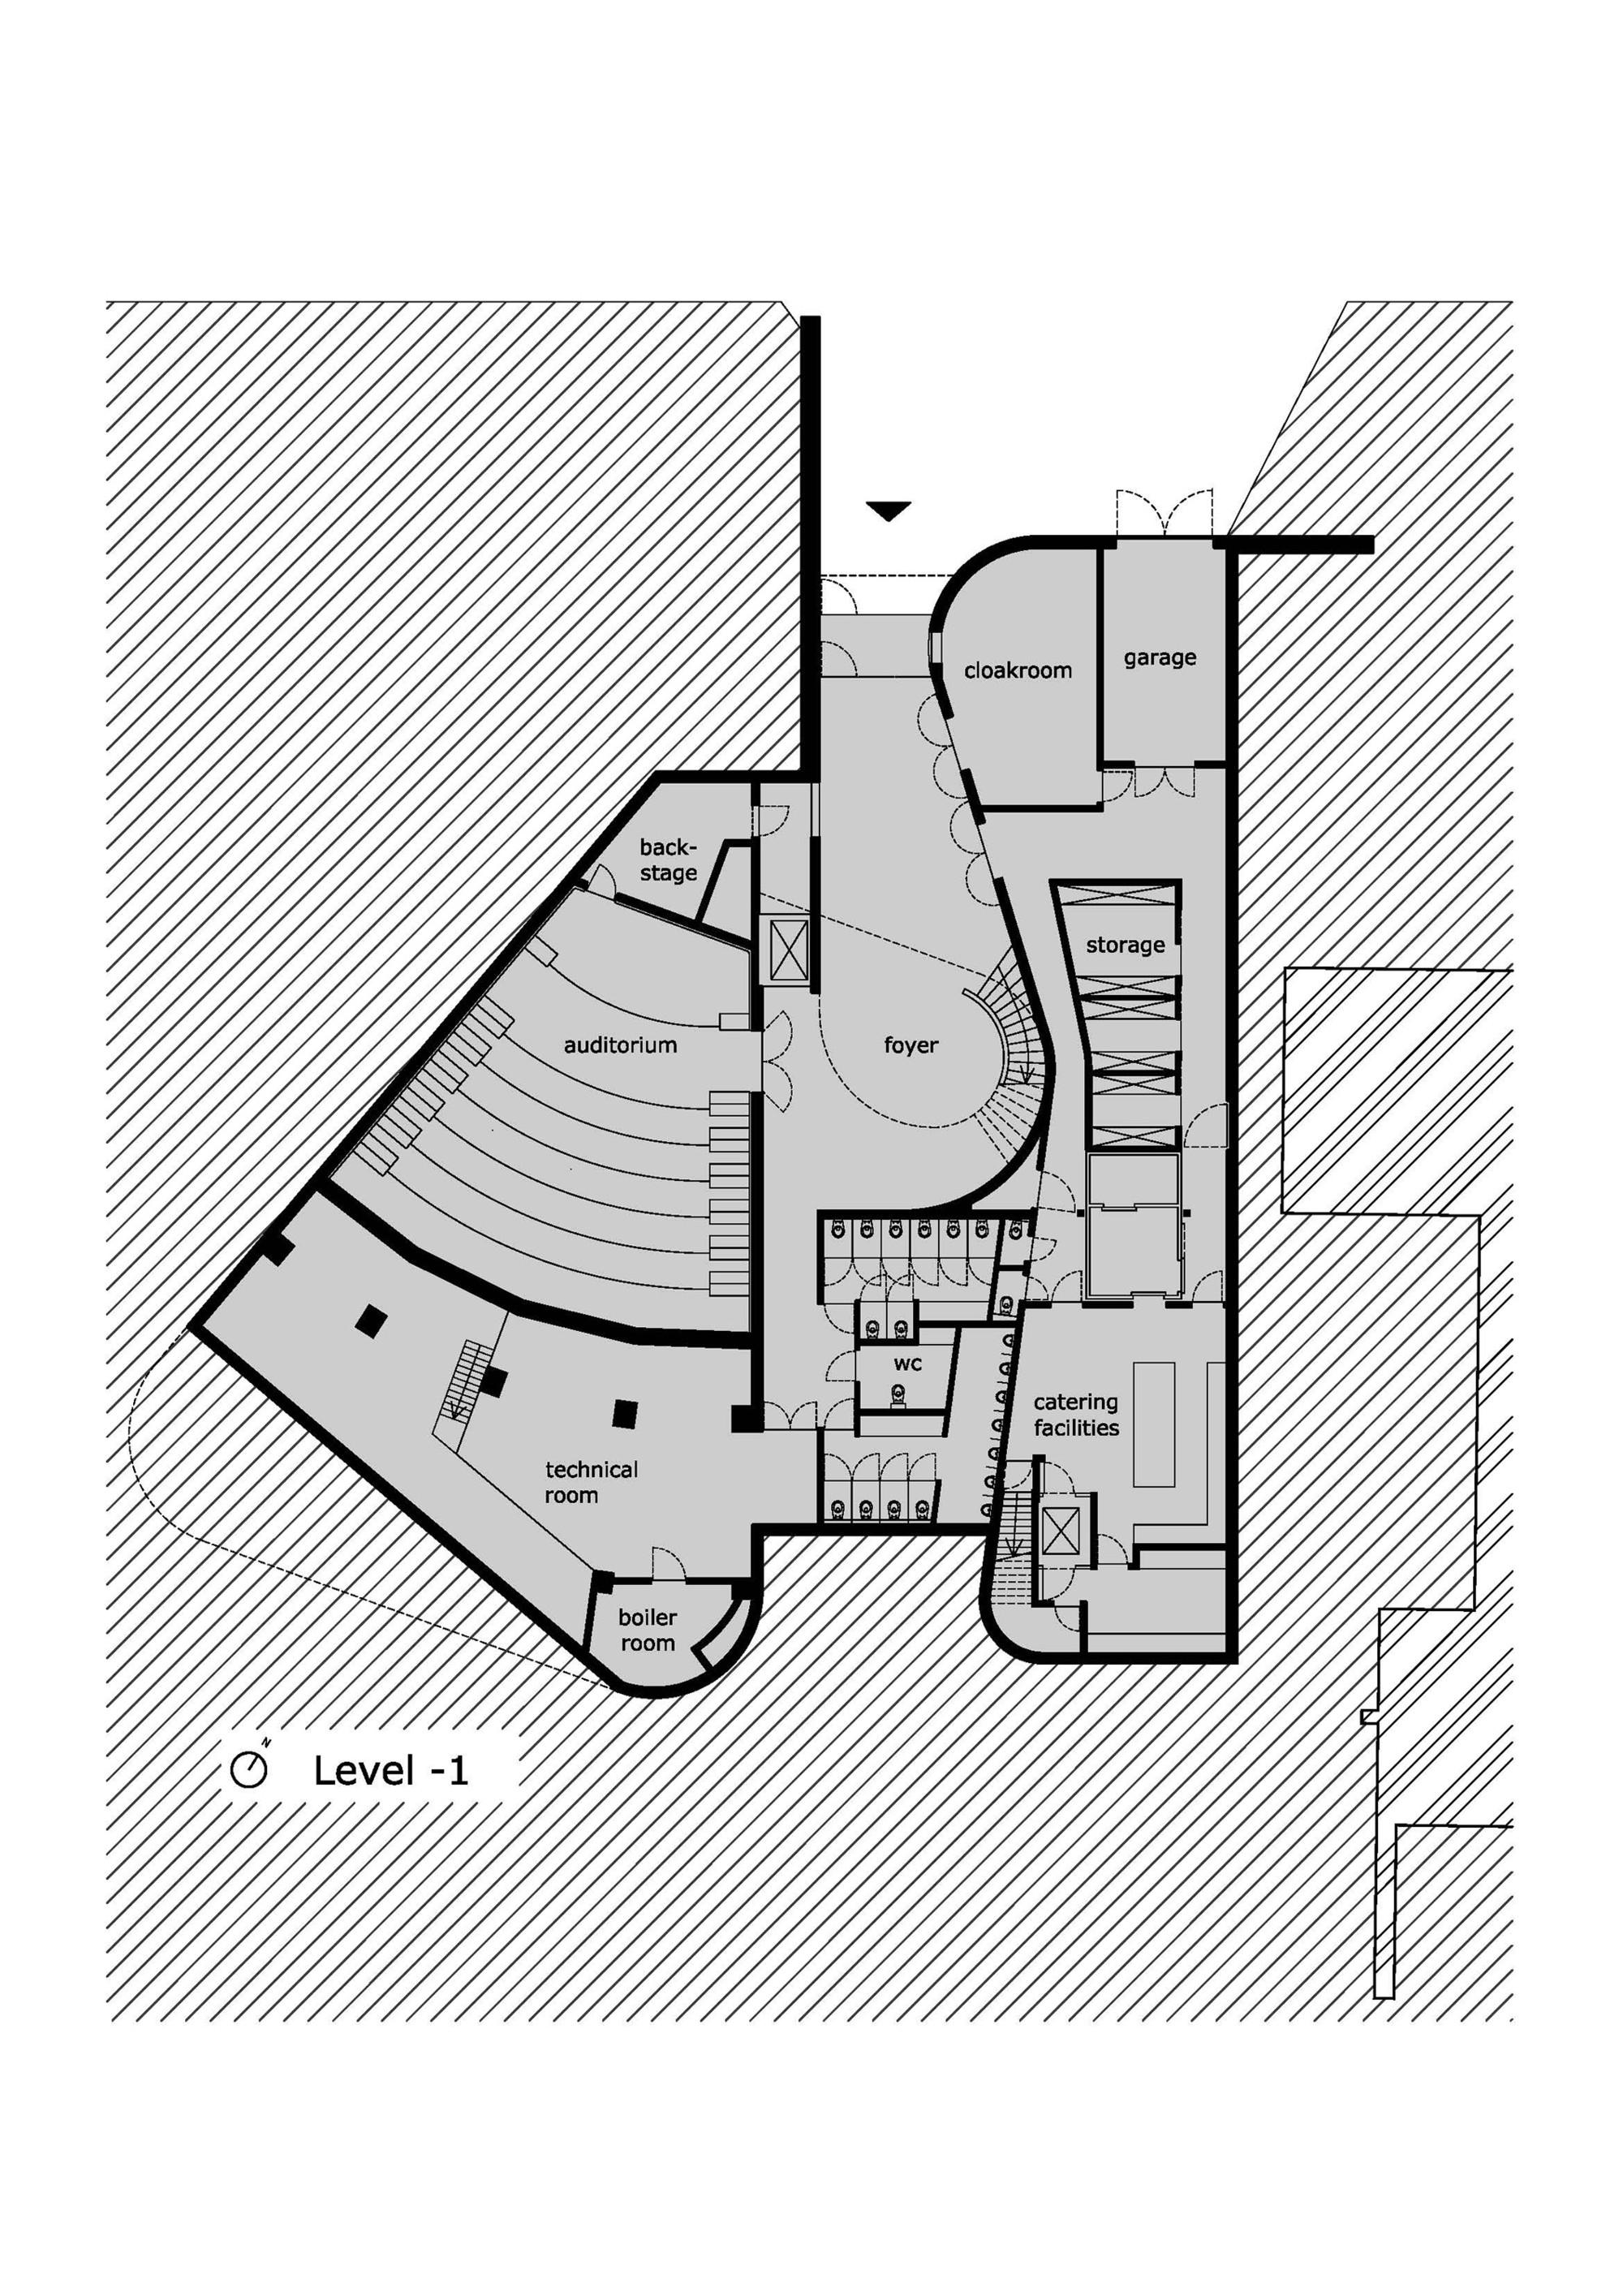 L Shaped Floor Plan Gallery Of Auditorium Az Groeninge Kortrijk Dehullu